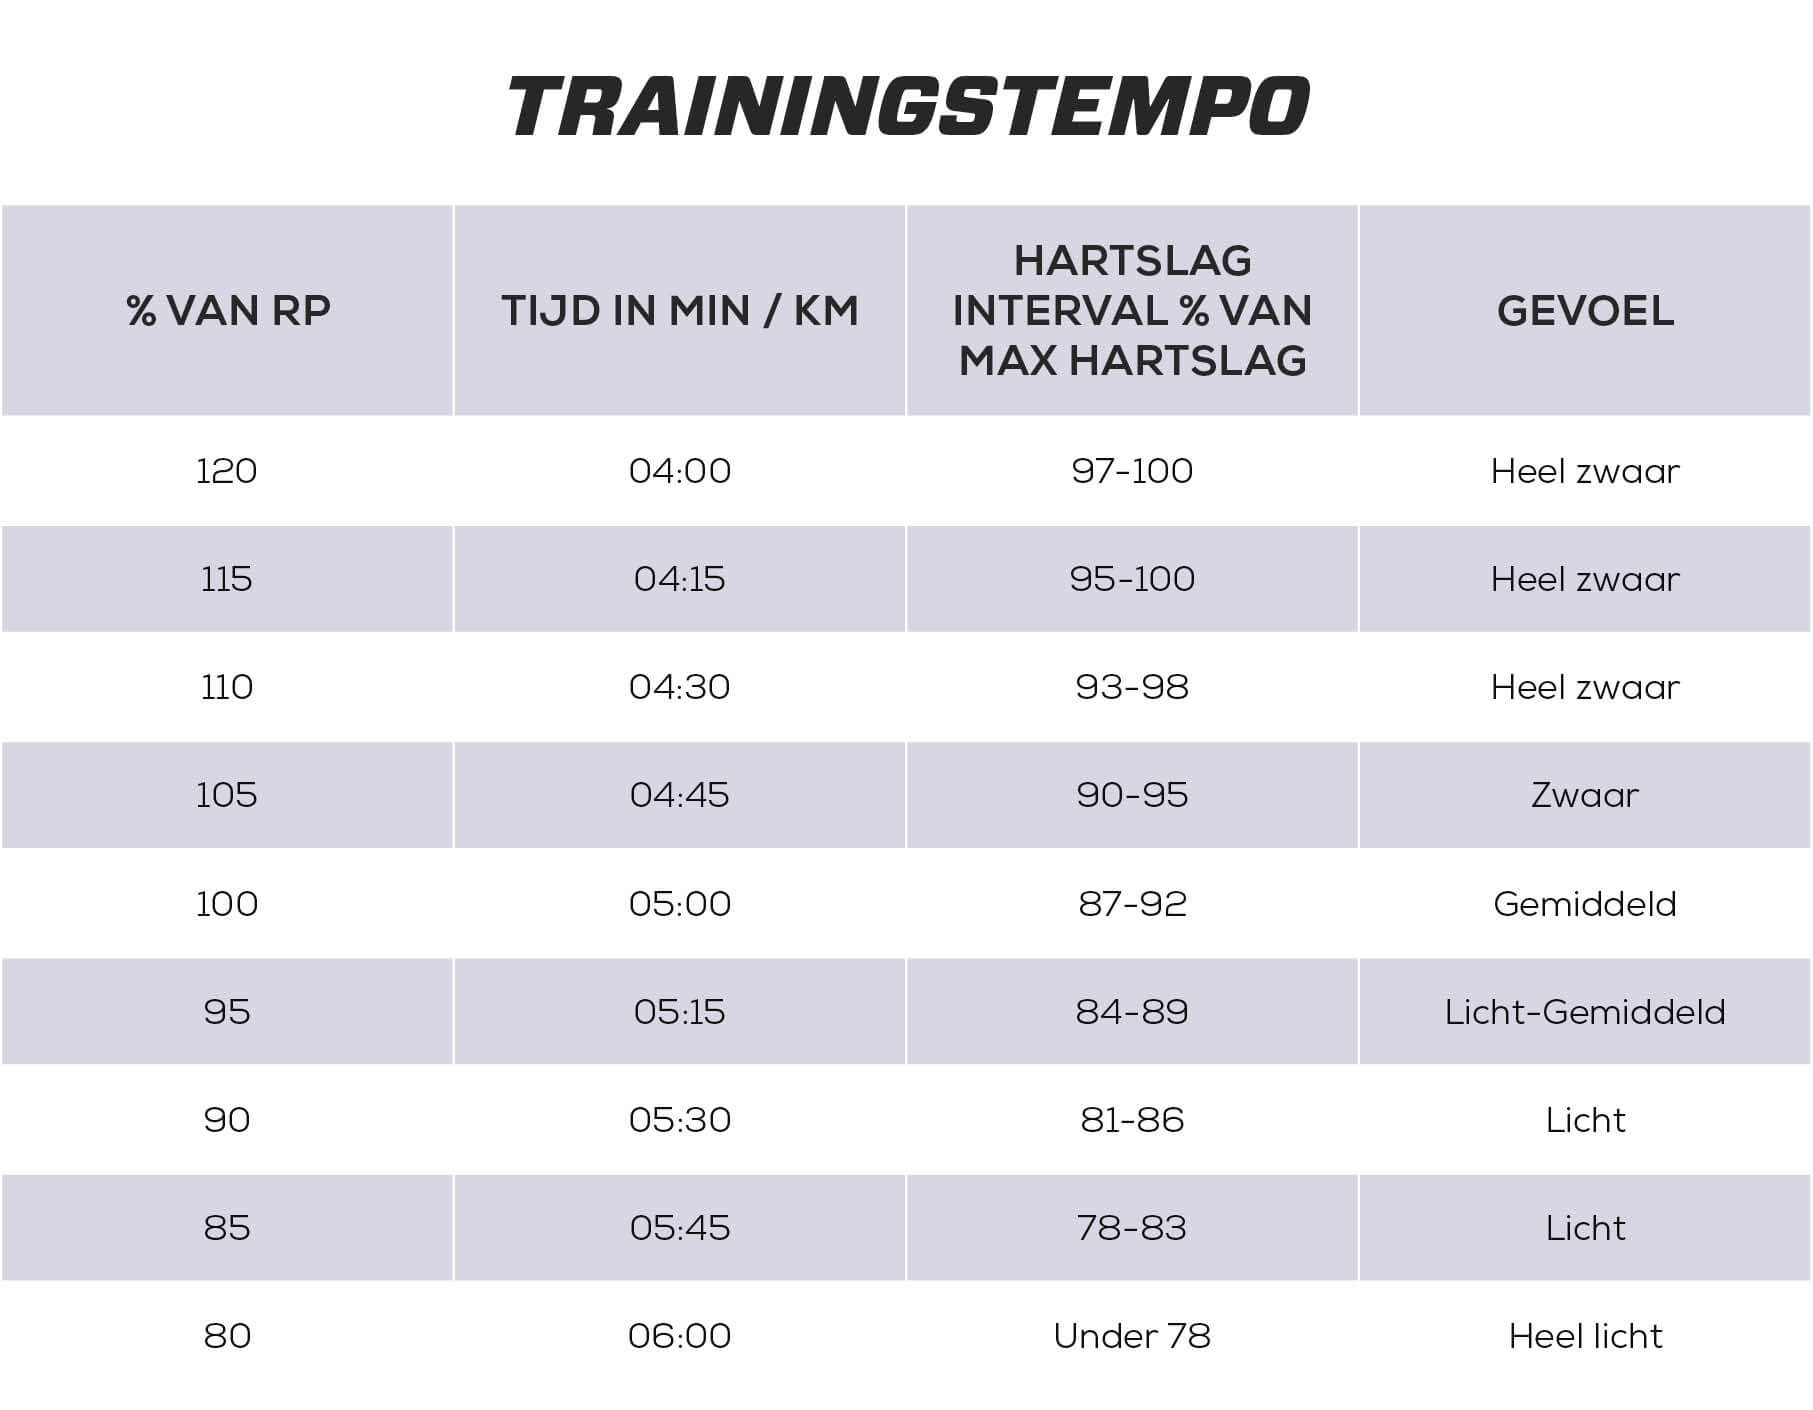 Trainingstempo